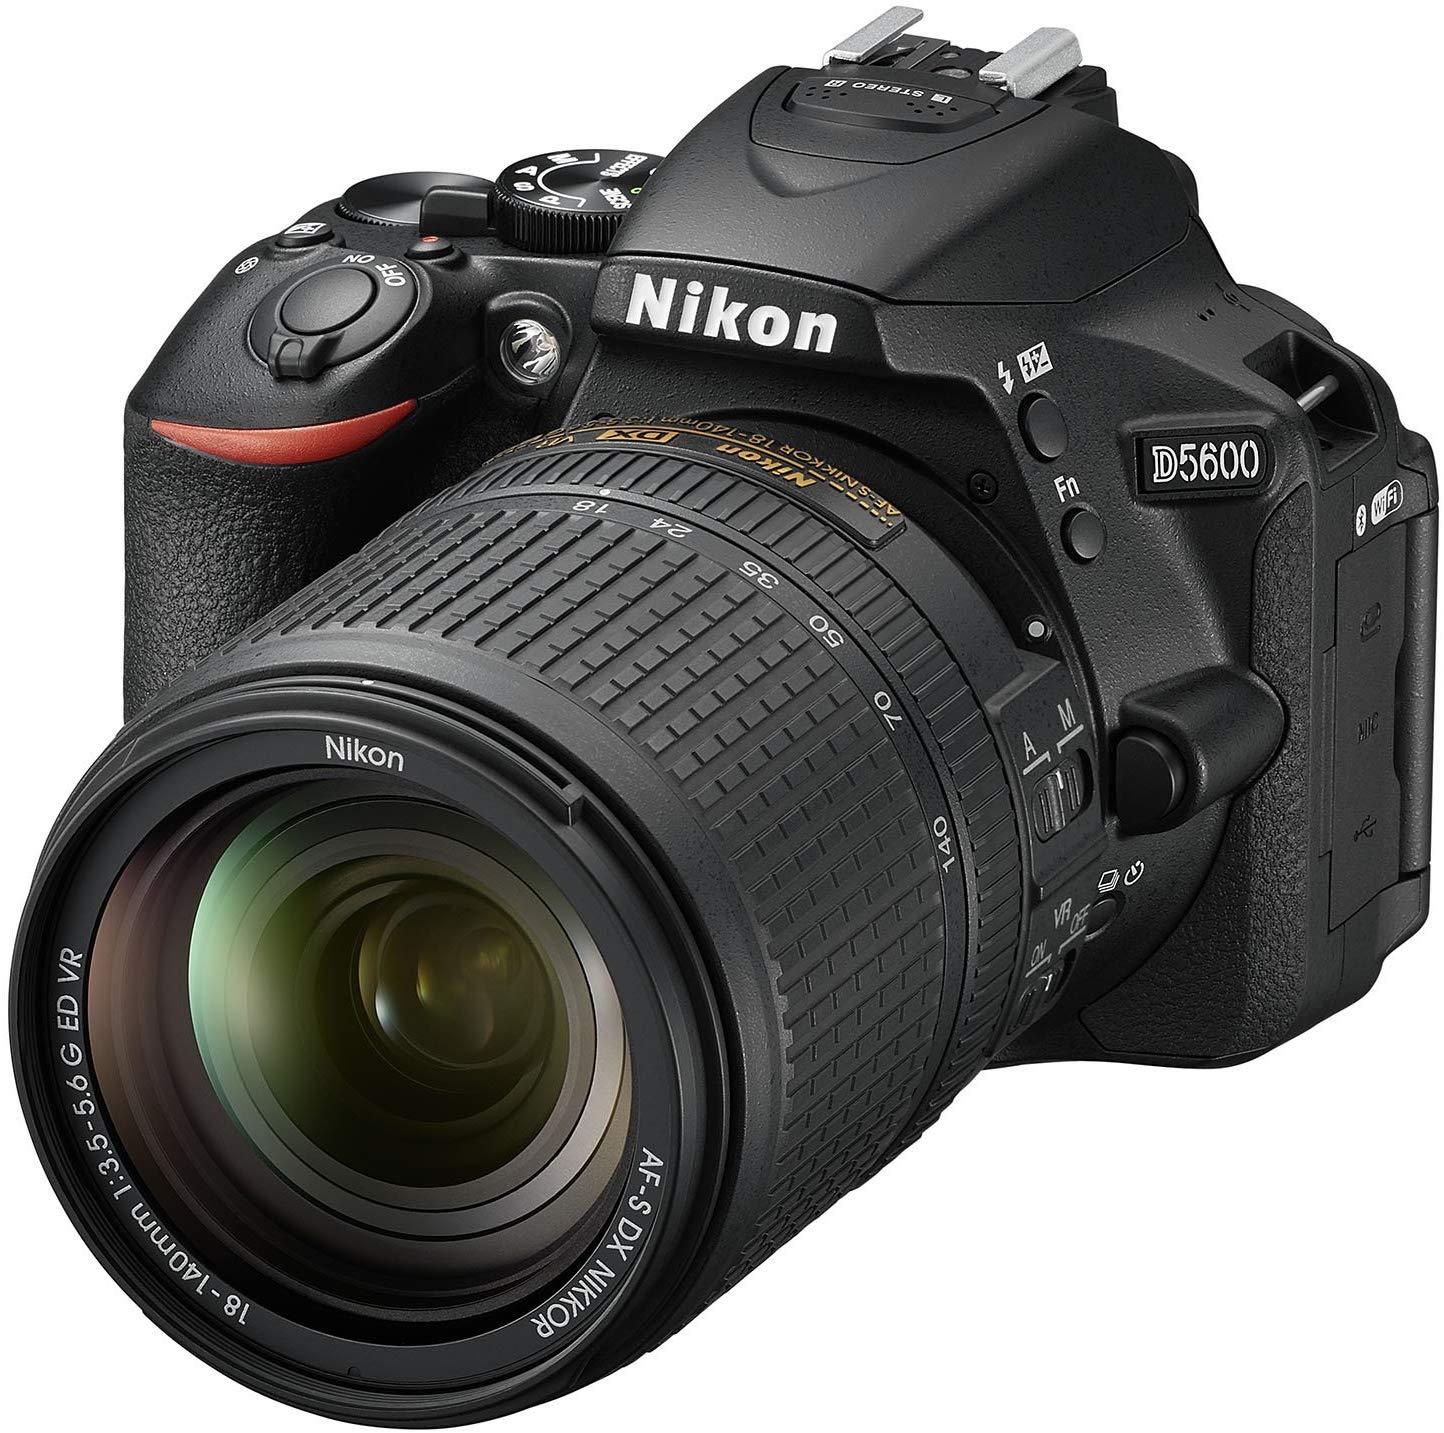 Nikon D5600 fotocamera